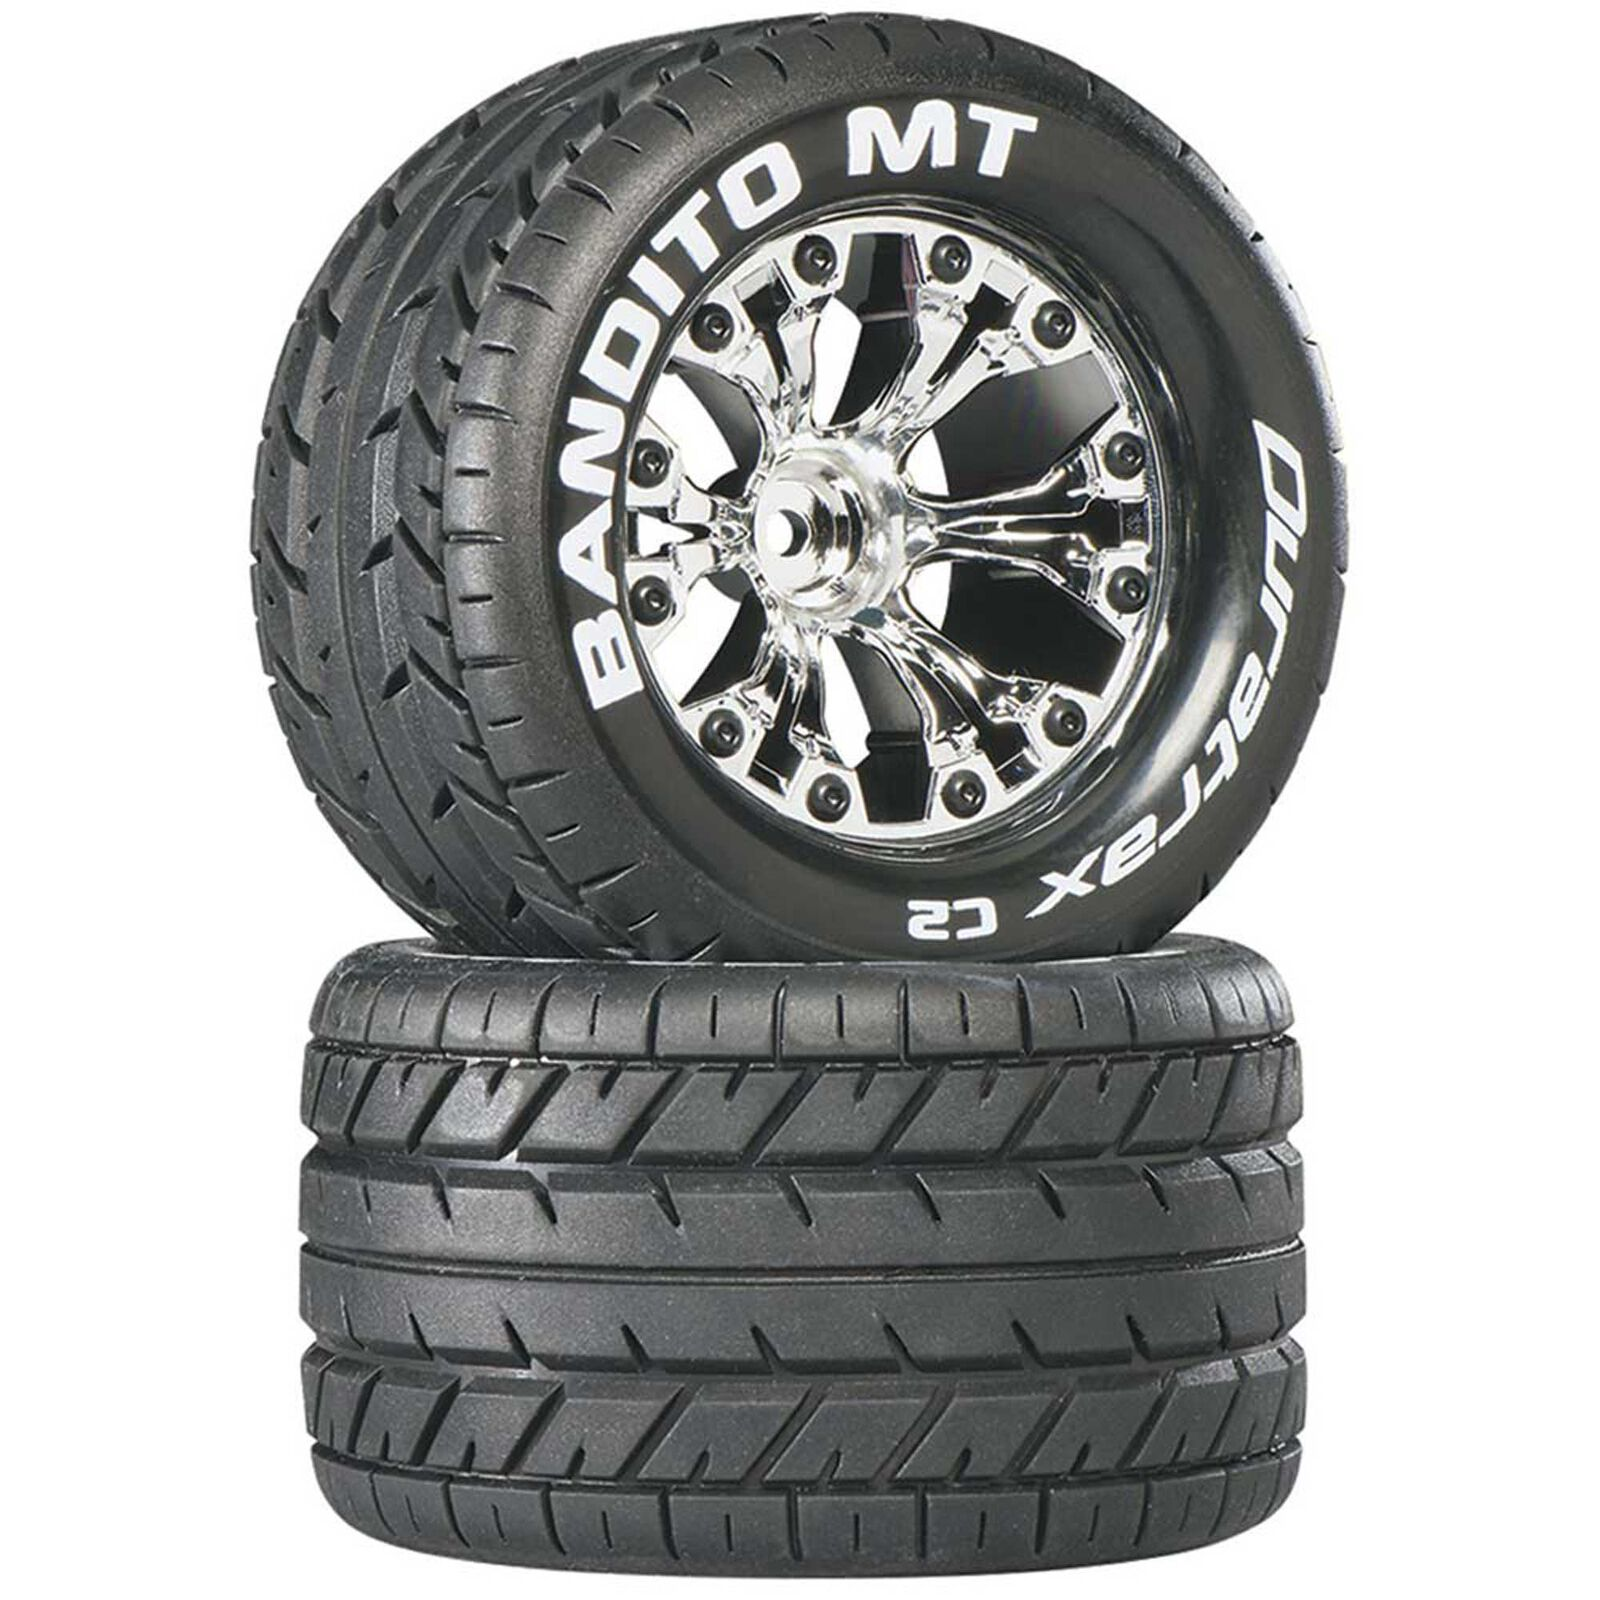 "Bandito MT 2.8"" Mounted 1/2"" Offset Tires, Chrome (2)"